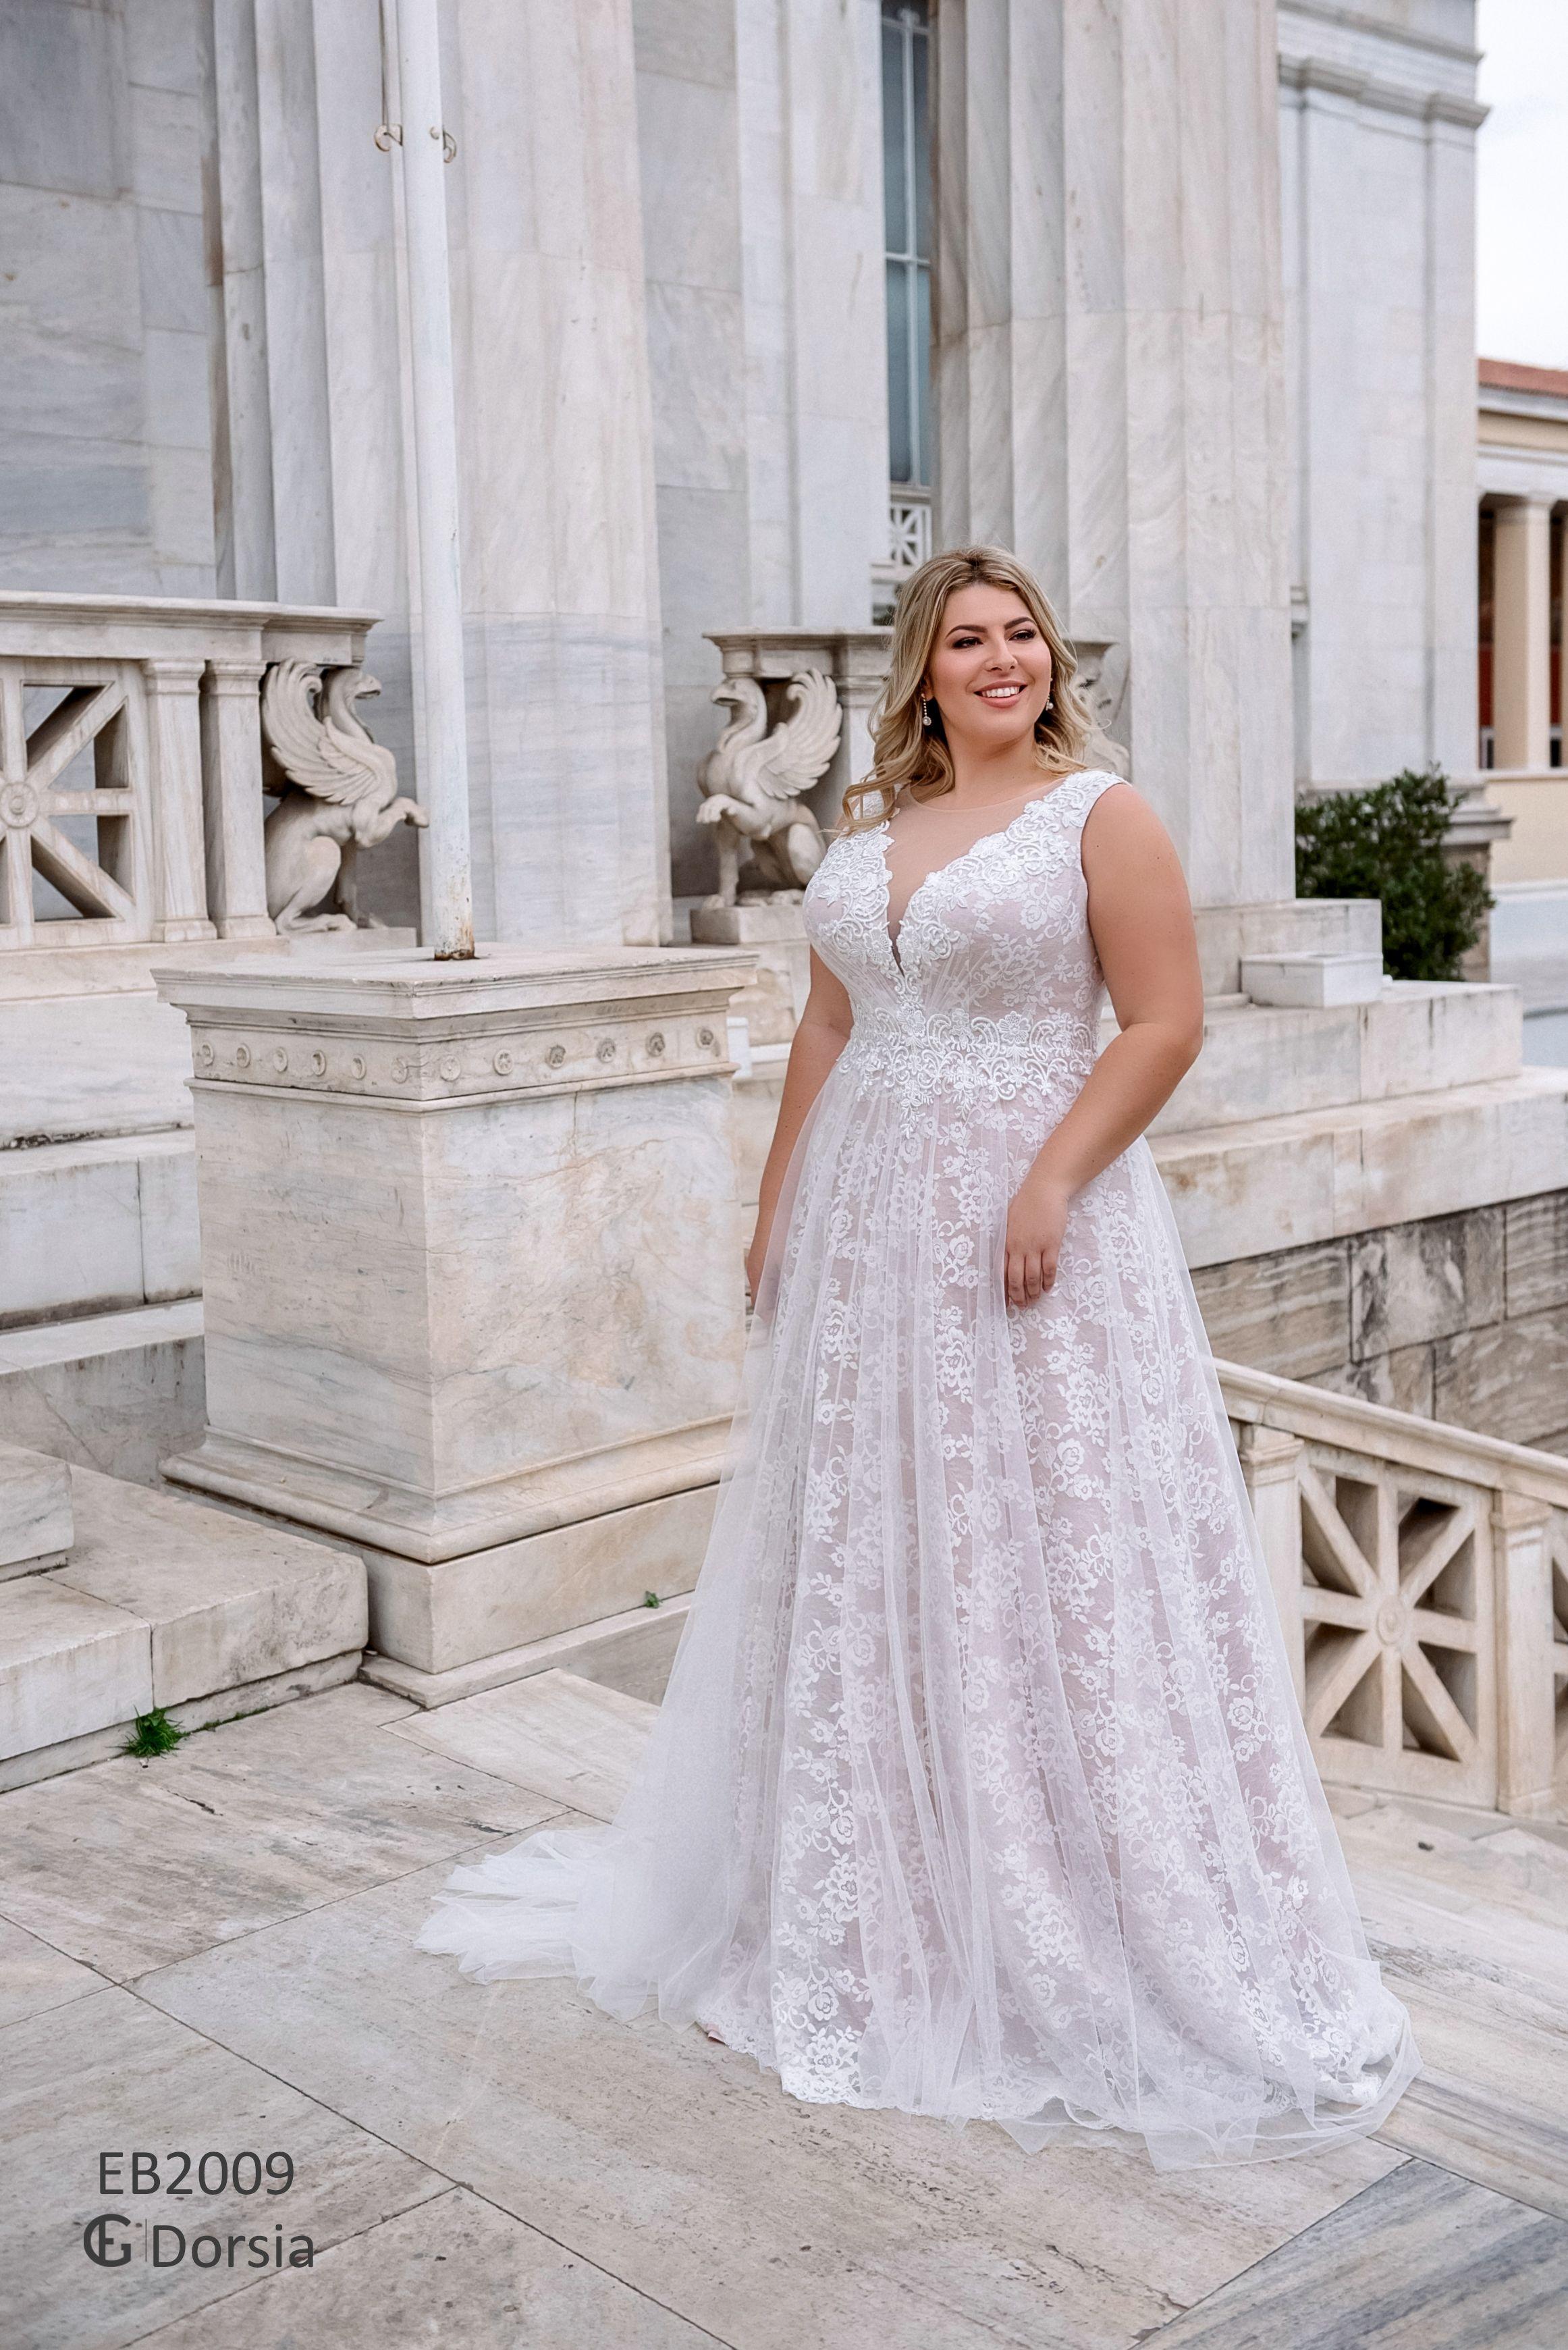 Dorsia Wedding Dress Plus Size 2020 Handmade Wedding Bride Weddingdress Wedding Gown Dress Wedding Dresses Wedding Dresses Plus Size Big Size Bride [ 3481 x 2323 Pixel ]